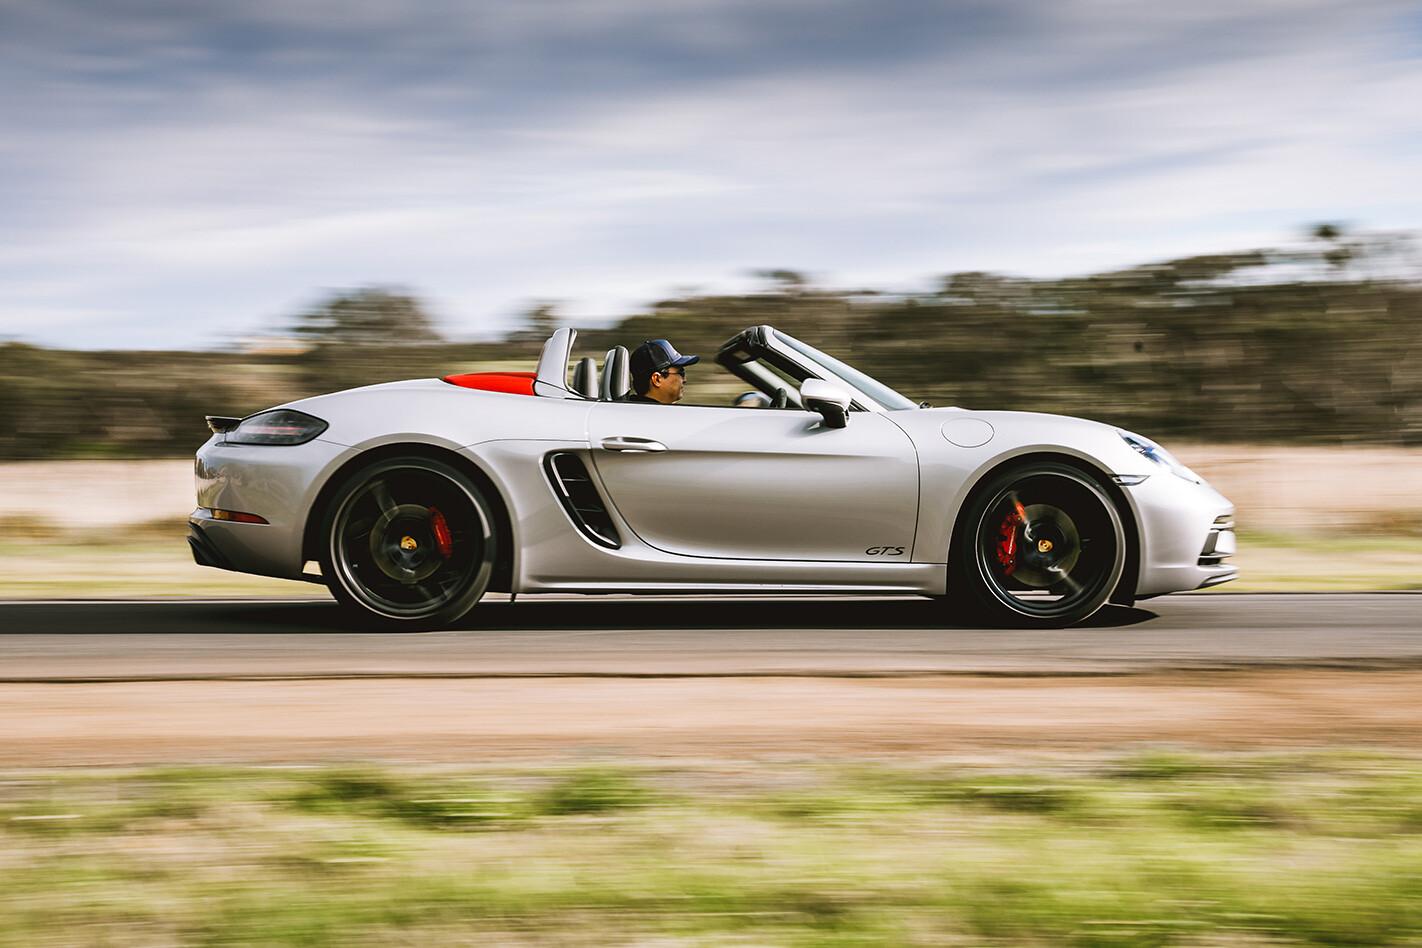 Porsche Boxster Gts Side Pan Jpg